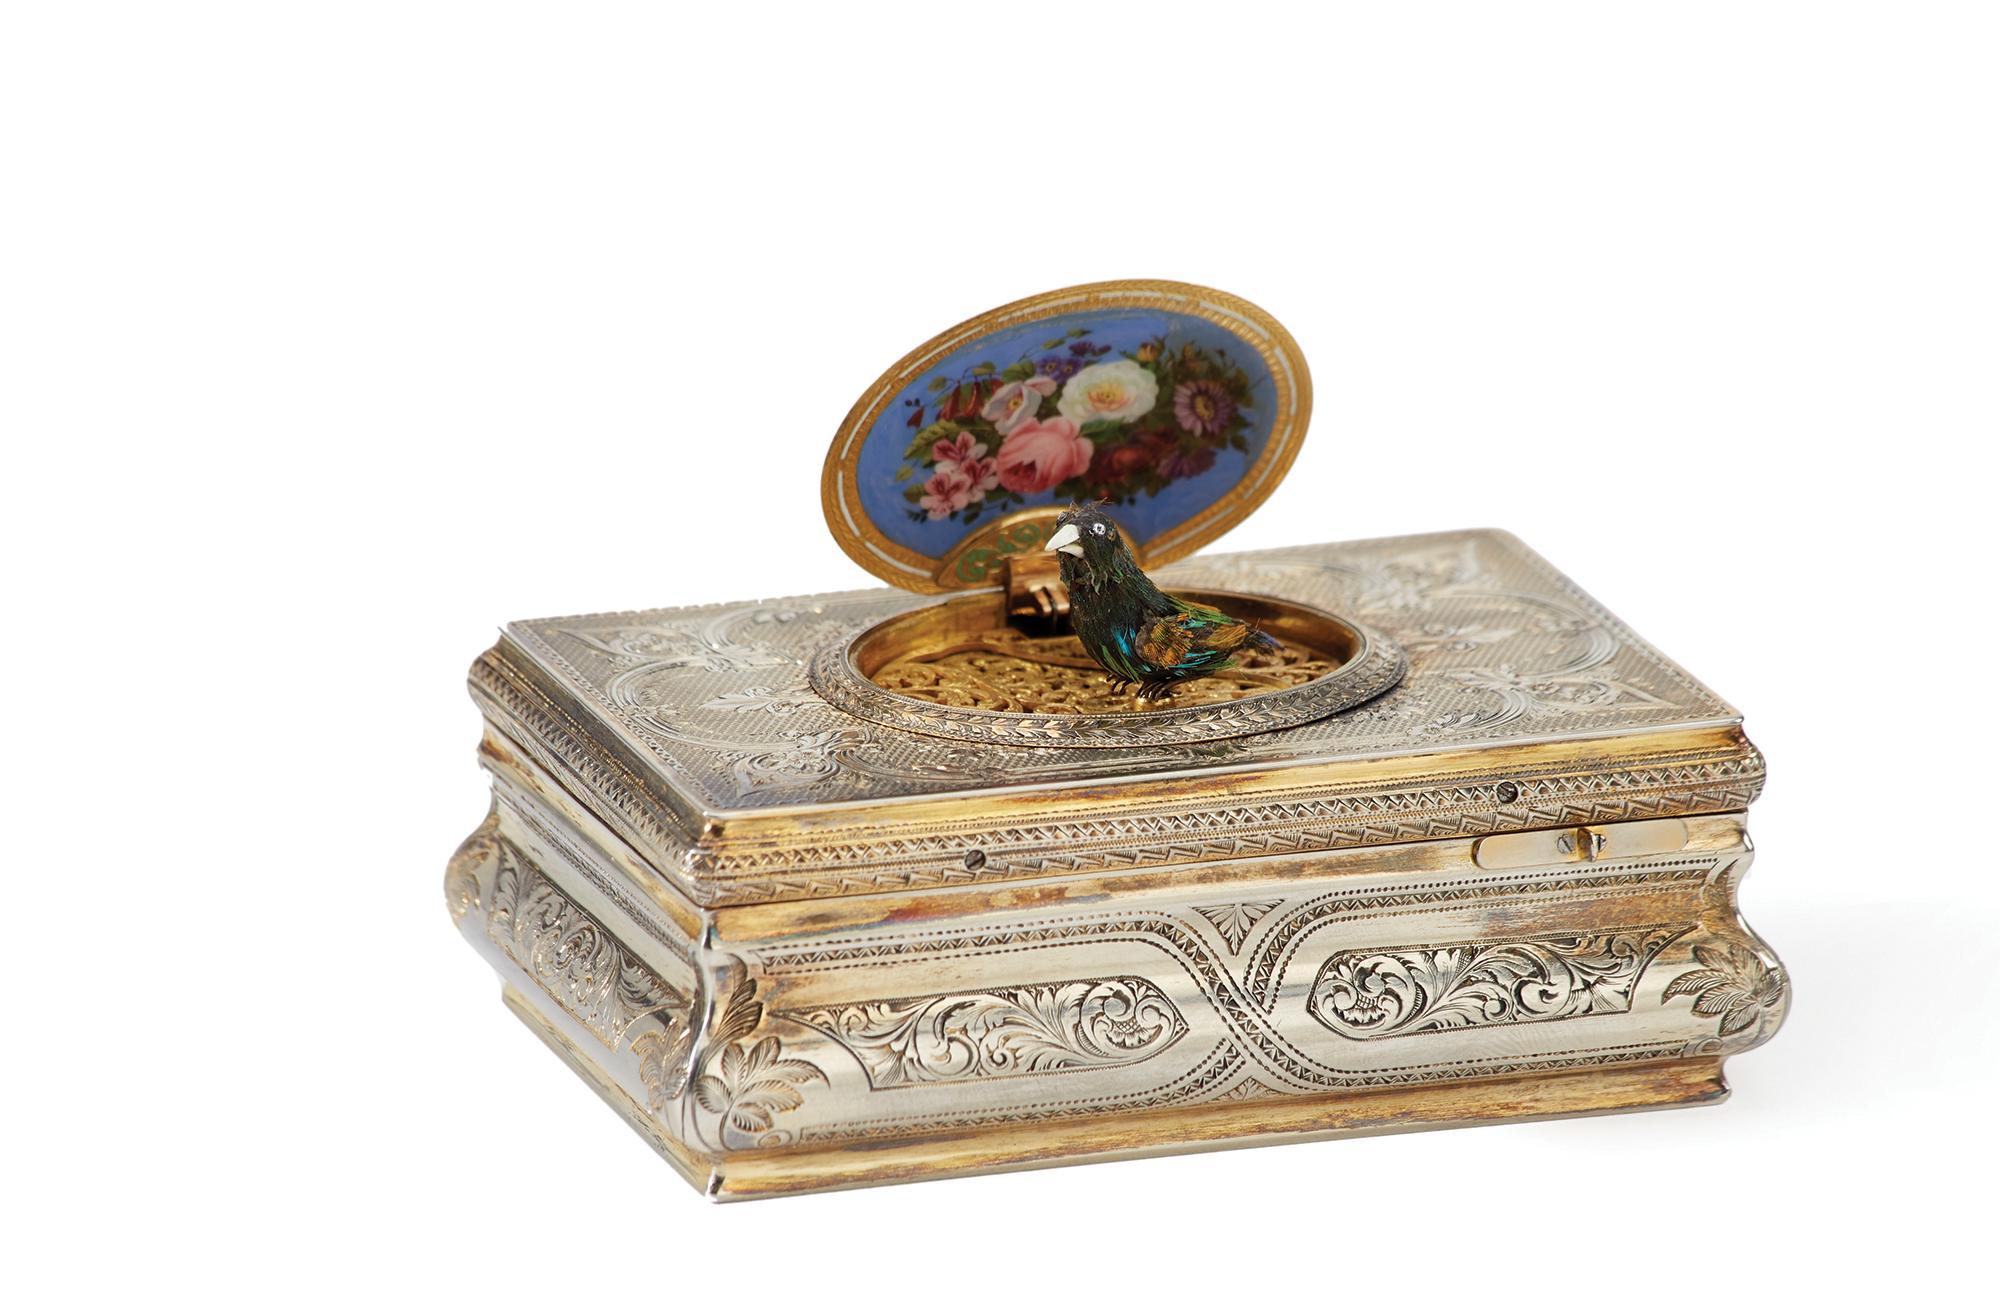 A Charles Bruguier vermeil and enamel fusée bird music box $10,000-15,000